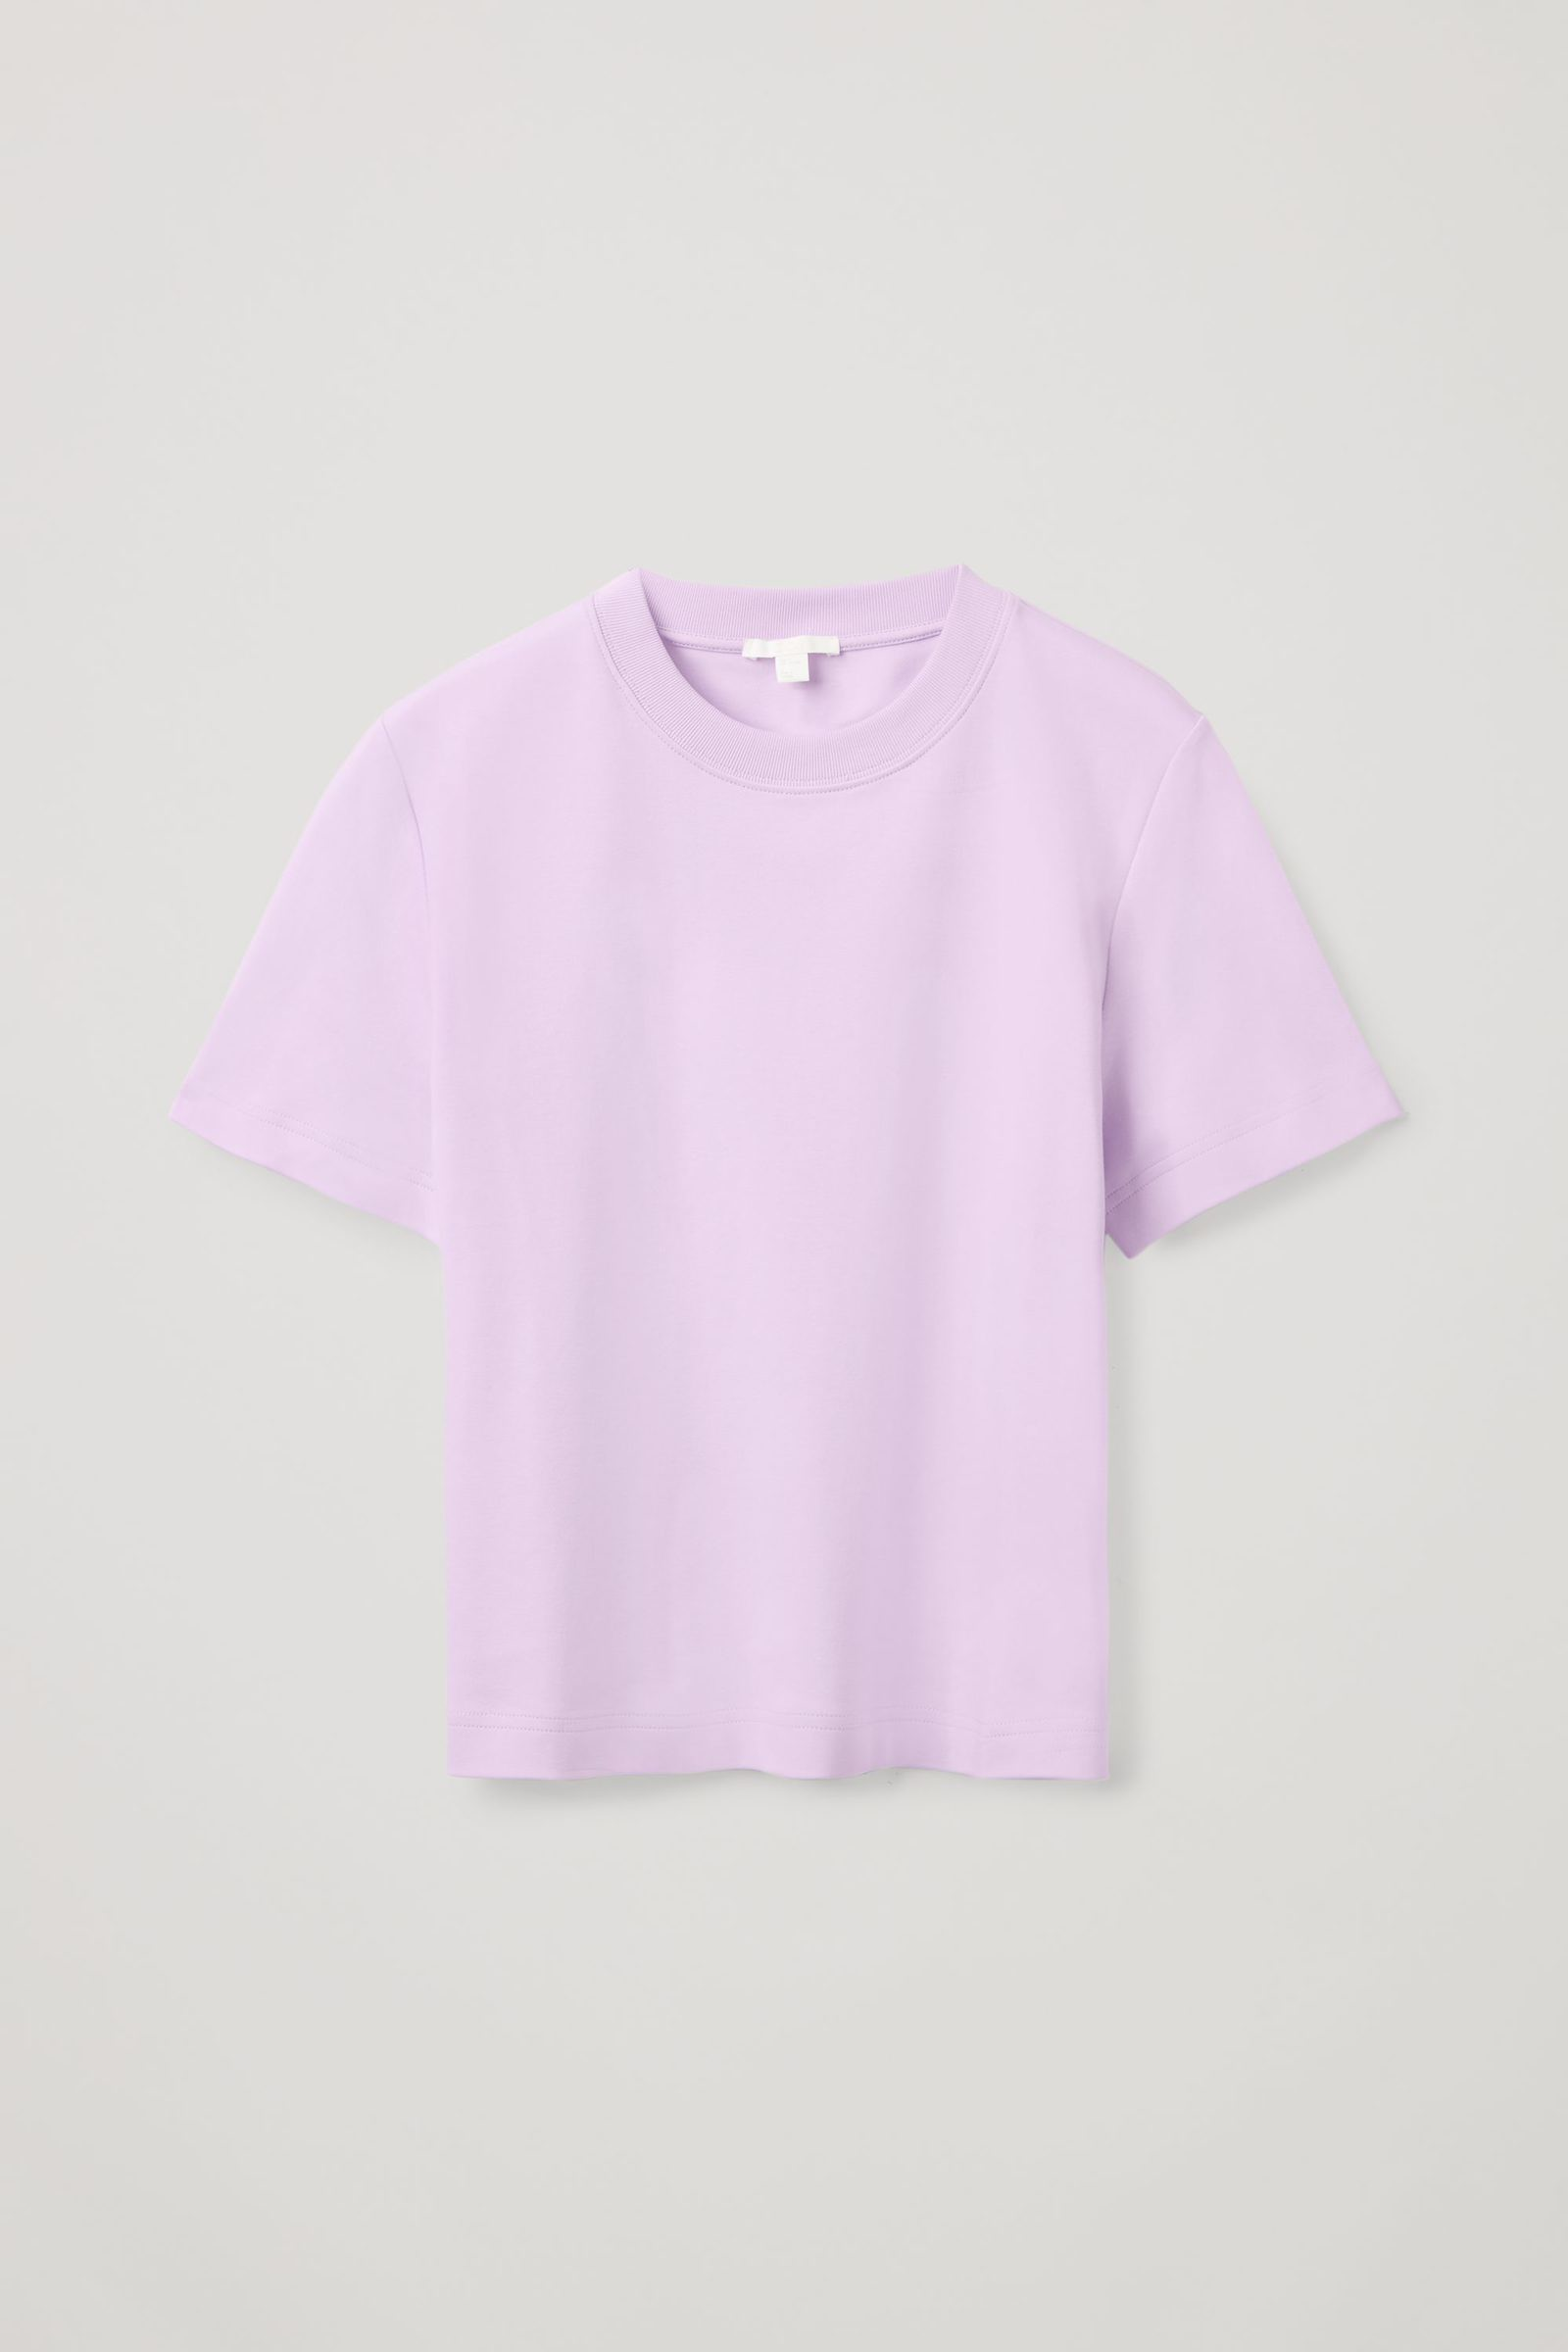 COS 슬림 핏 티셔츠의 퍼플컬러 Product입니다.